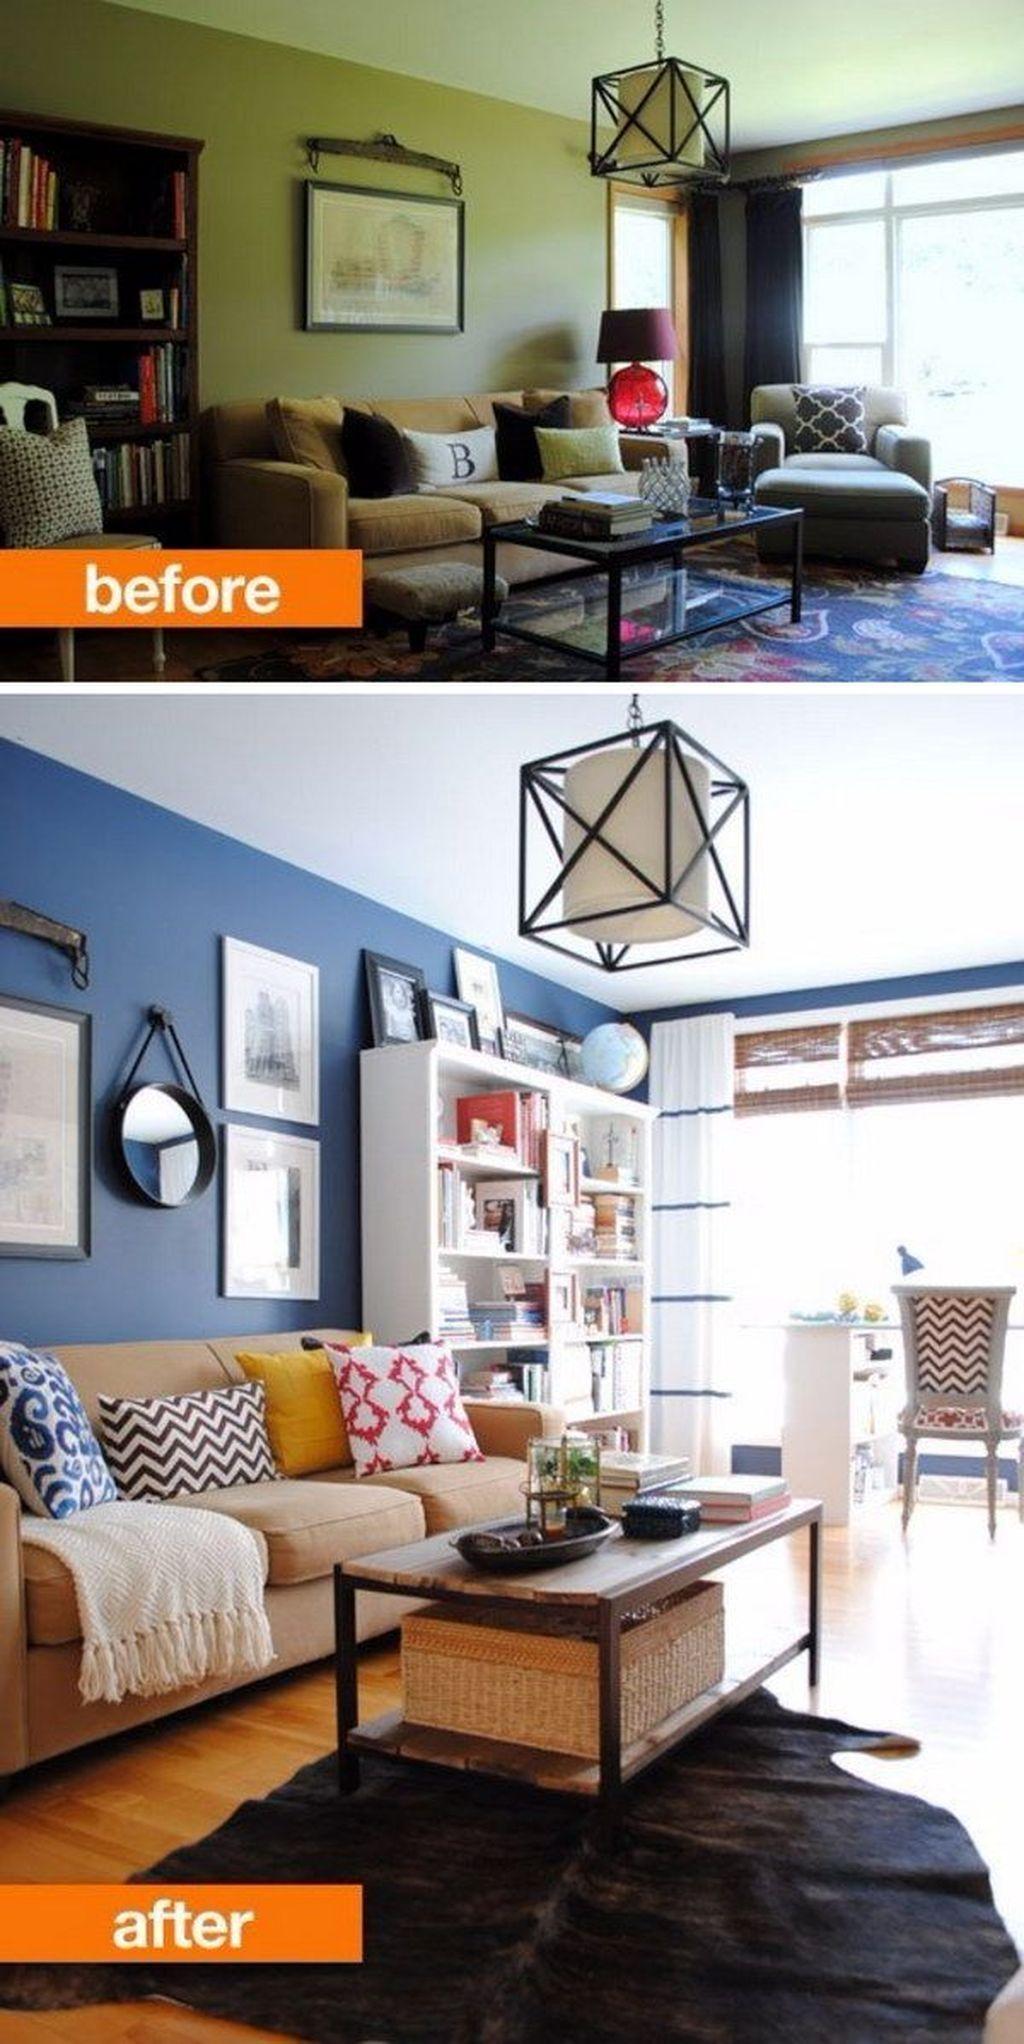 Small Apartment Balcony Garden Ideas: 50 Afforable Small Apartment Living Room Ideas On A Budget